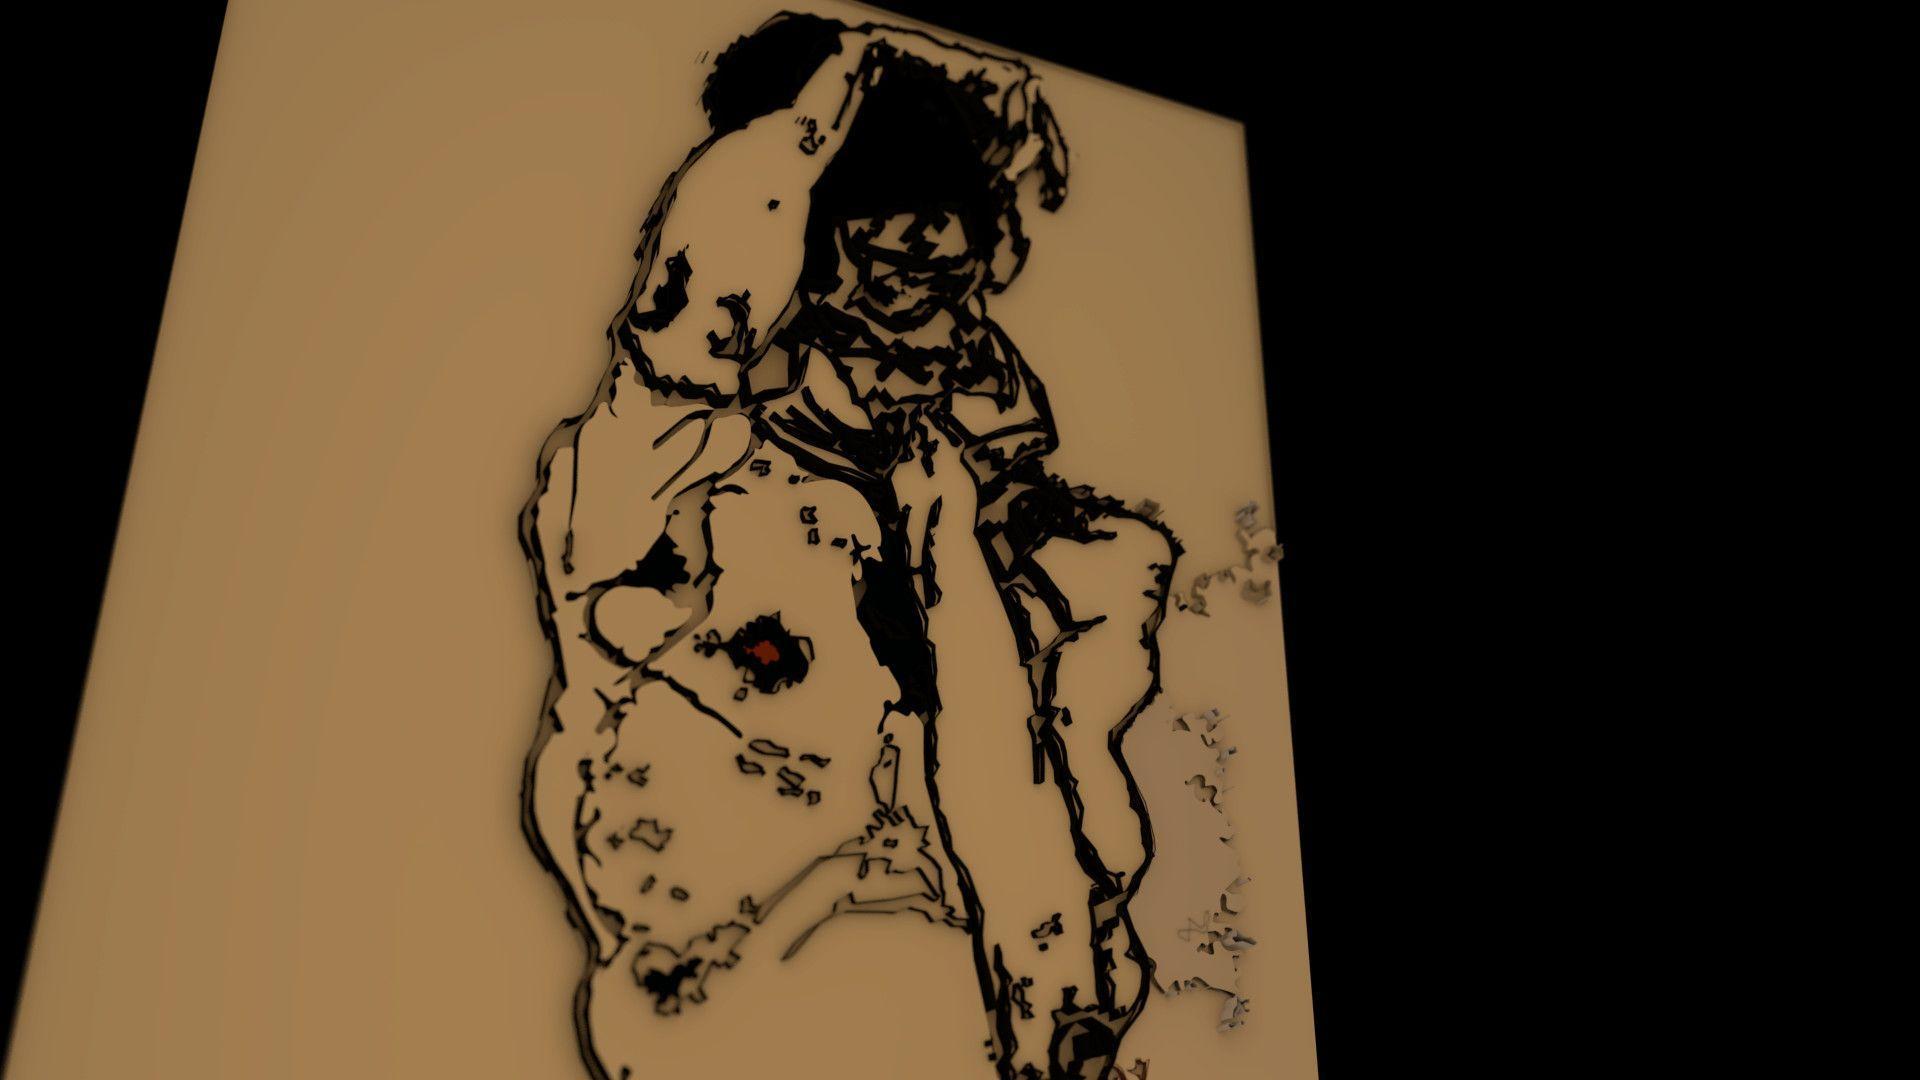 1920x1080 ArtStation - Egon Schiele Portrait Realiztion, Adam Adams